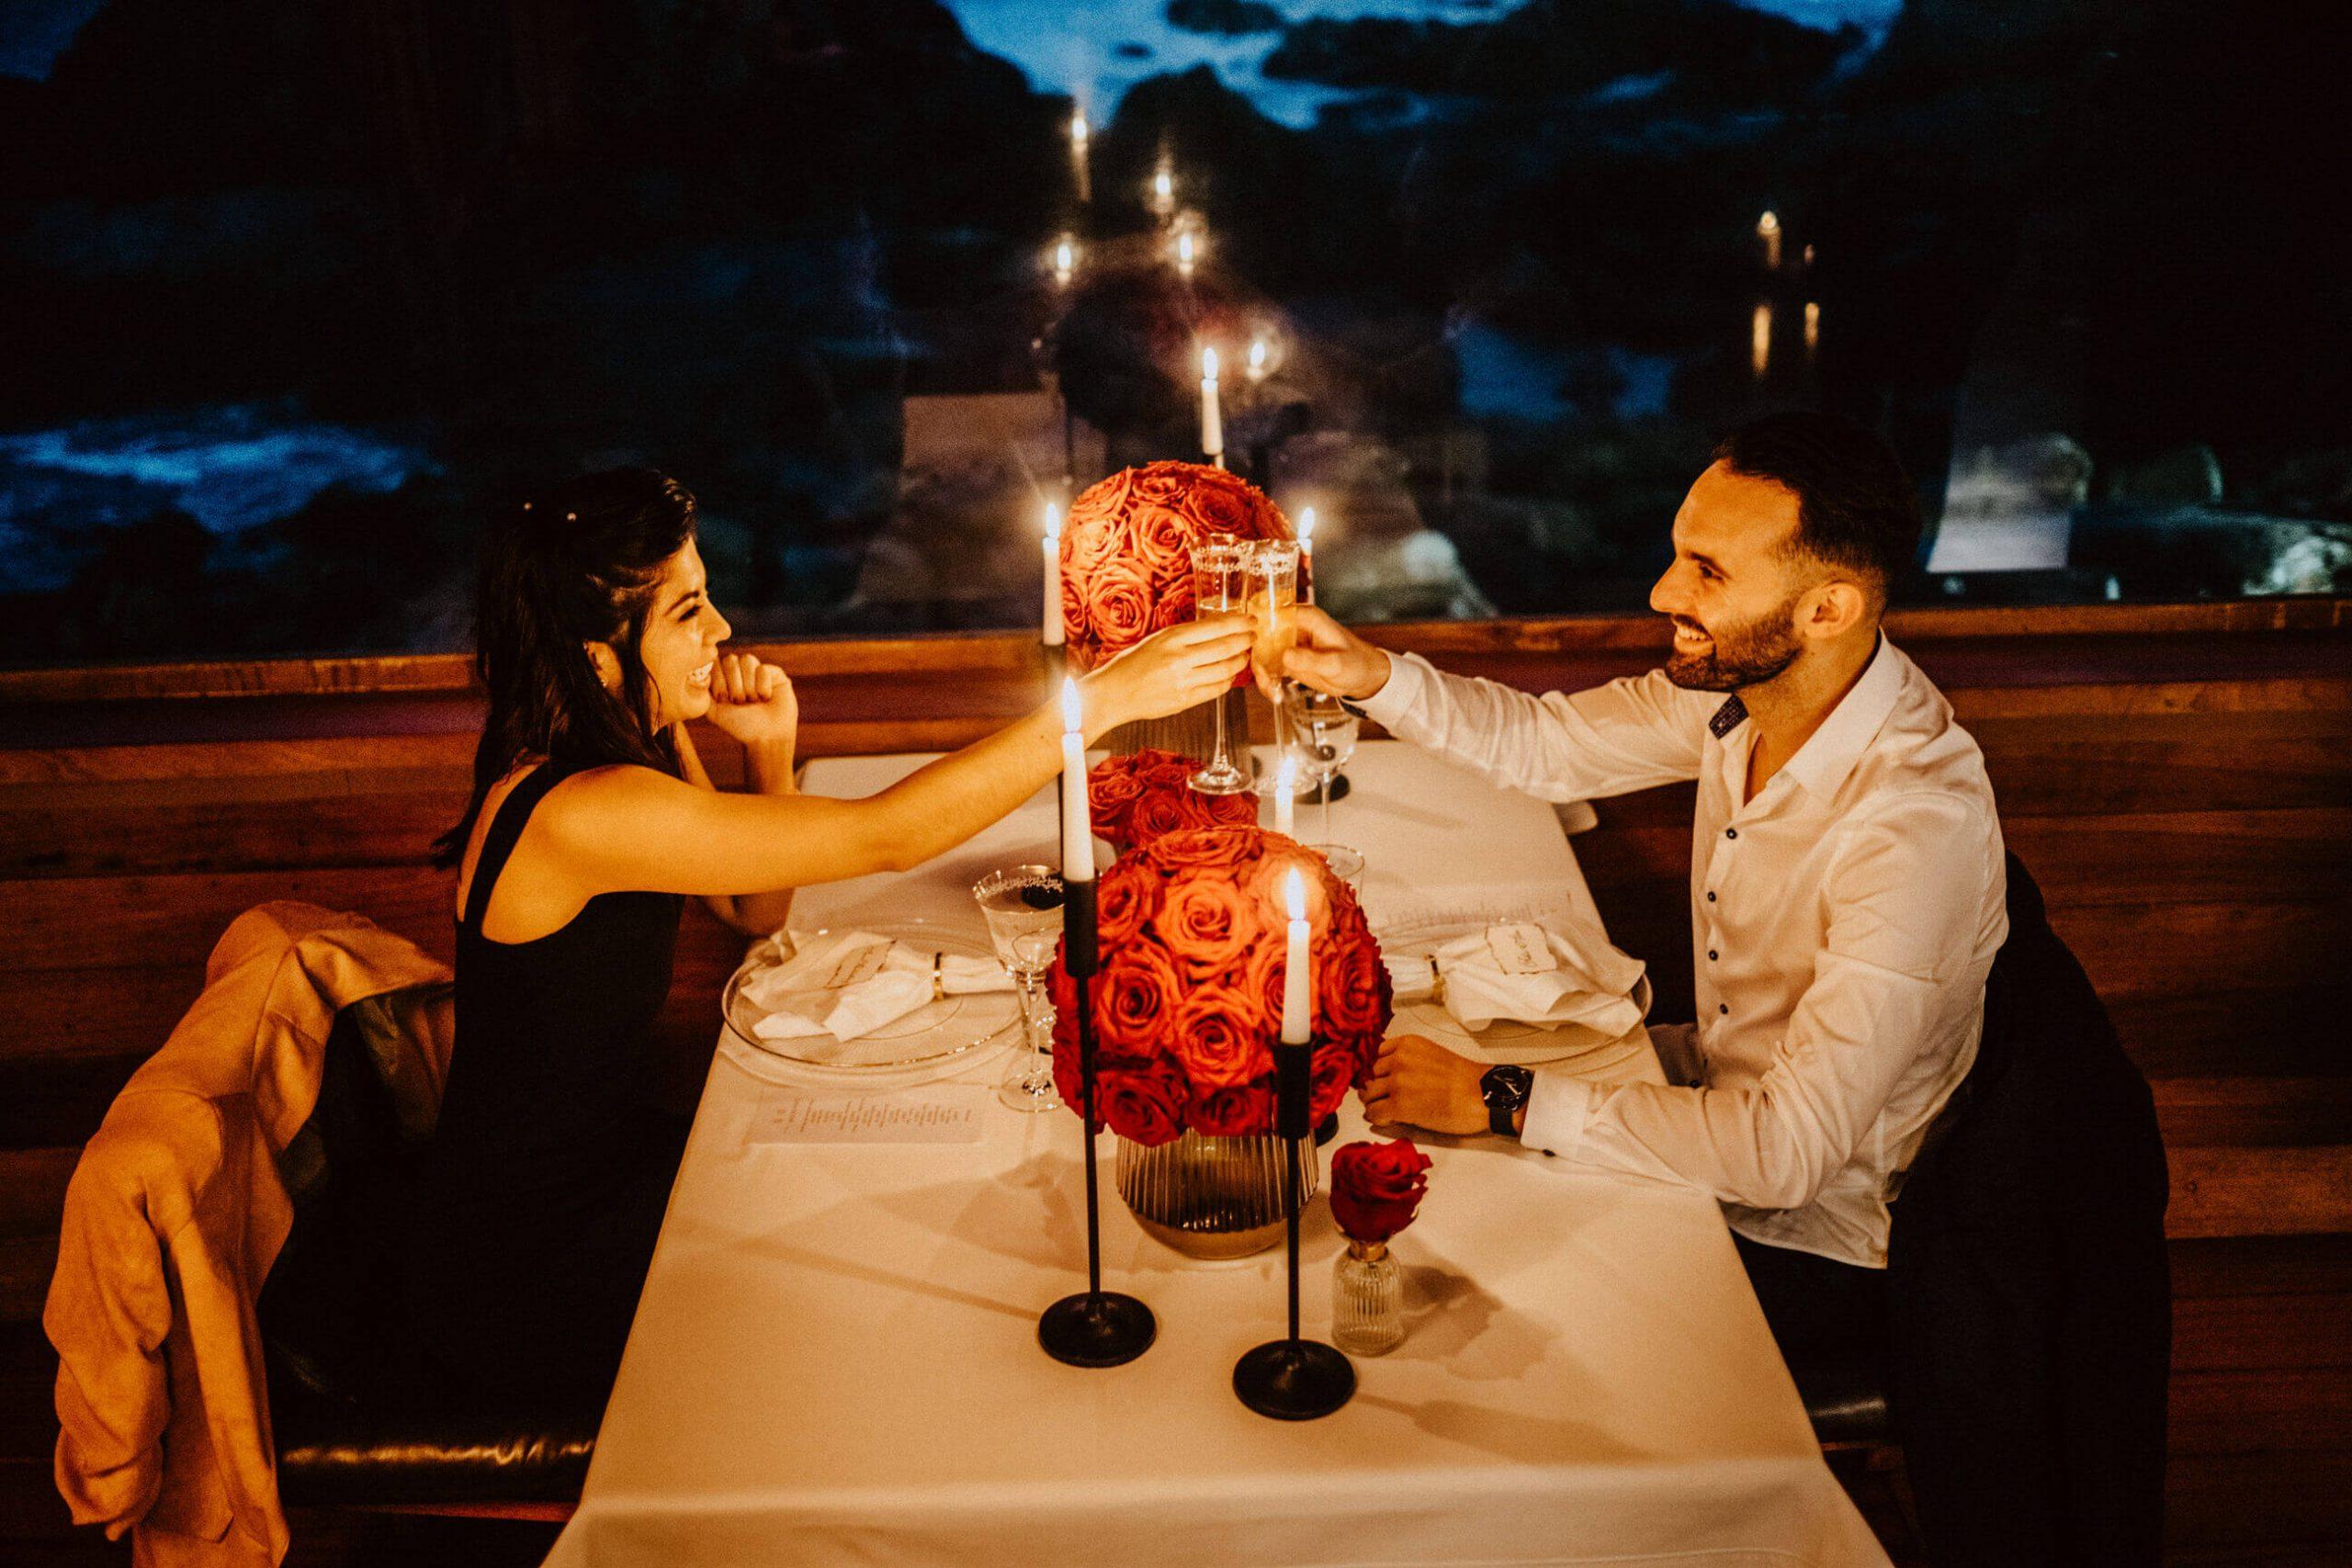 roma-organizacao-eventos-pedido-casamento-casa-de-cha-da-boa-nova-porto-portugal-26